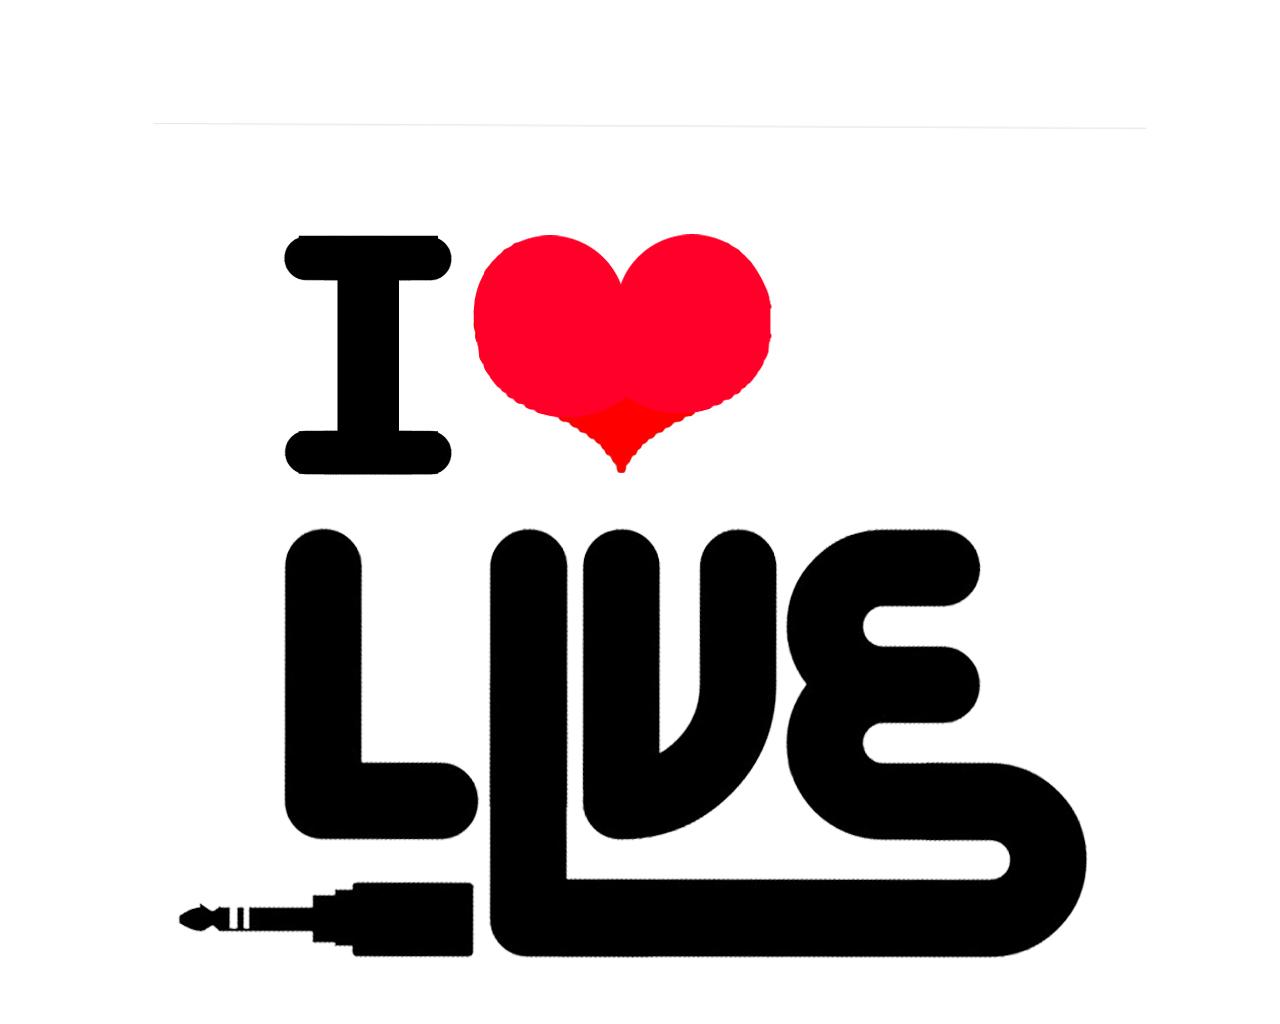 iluvlive secondary logo 2.jpg